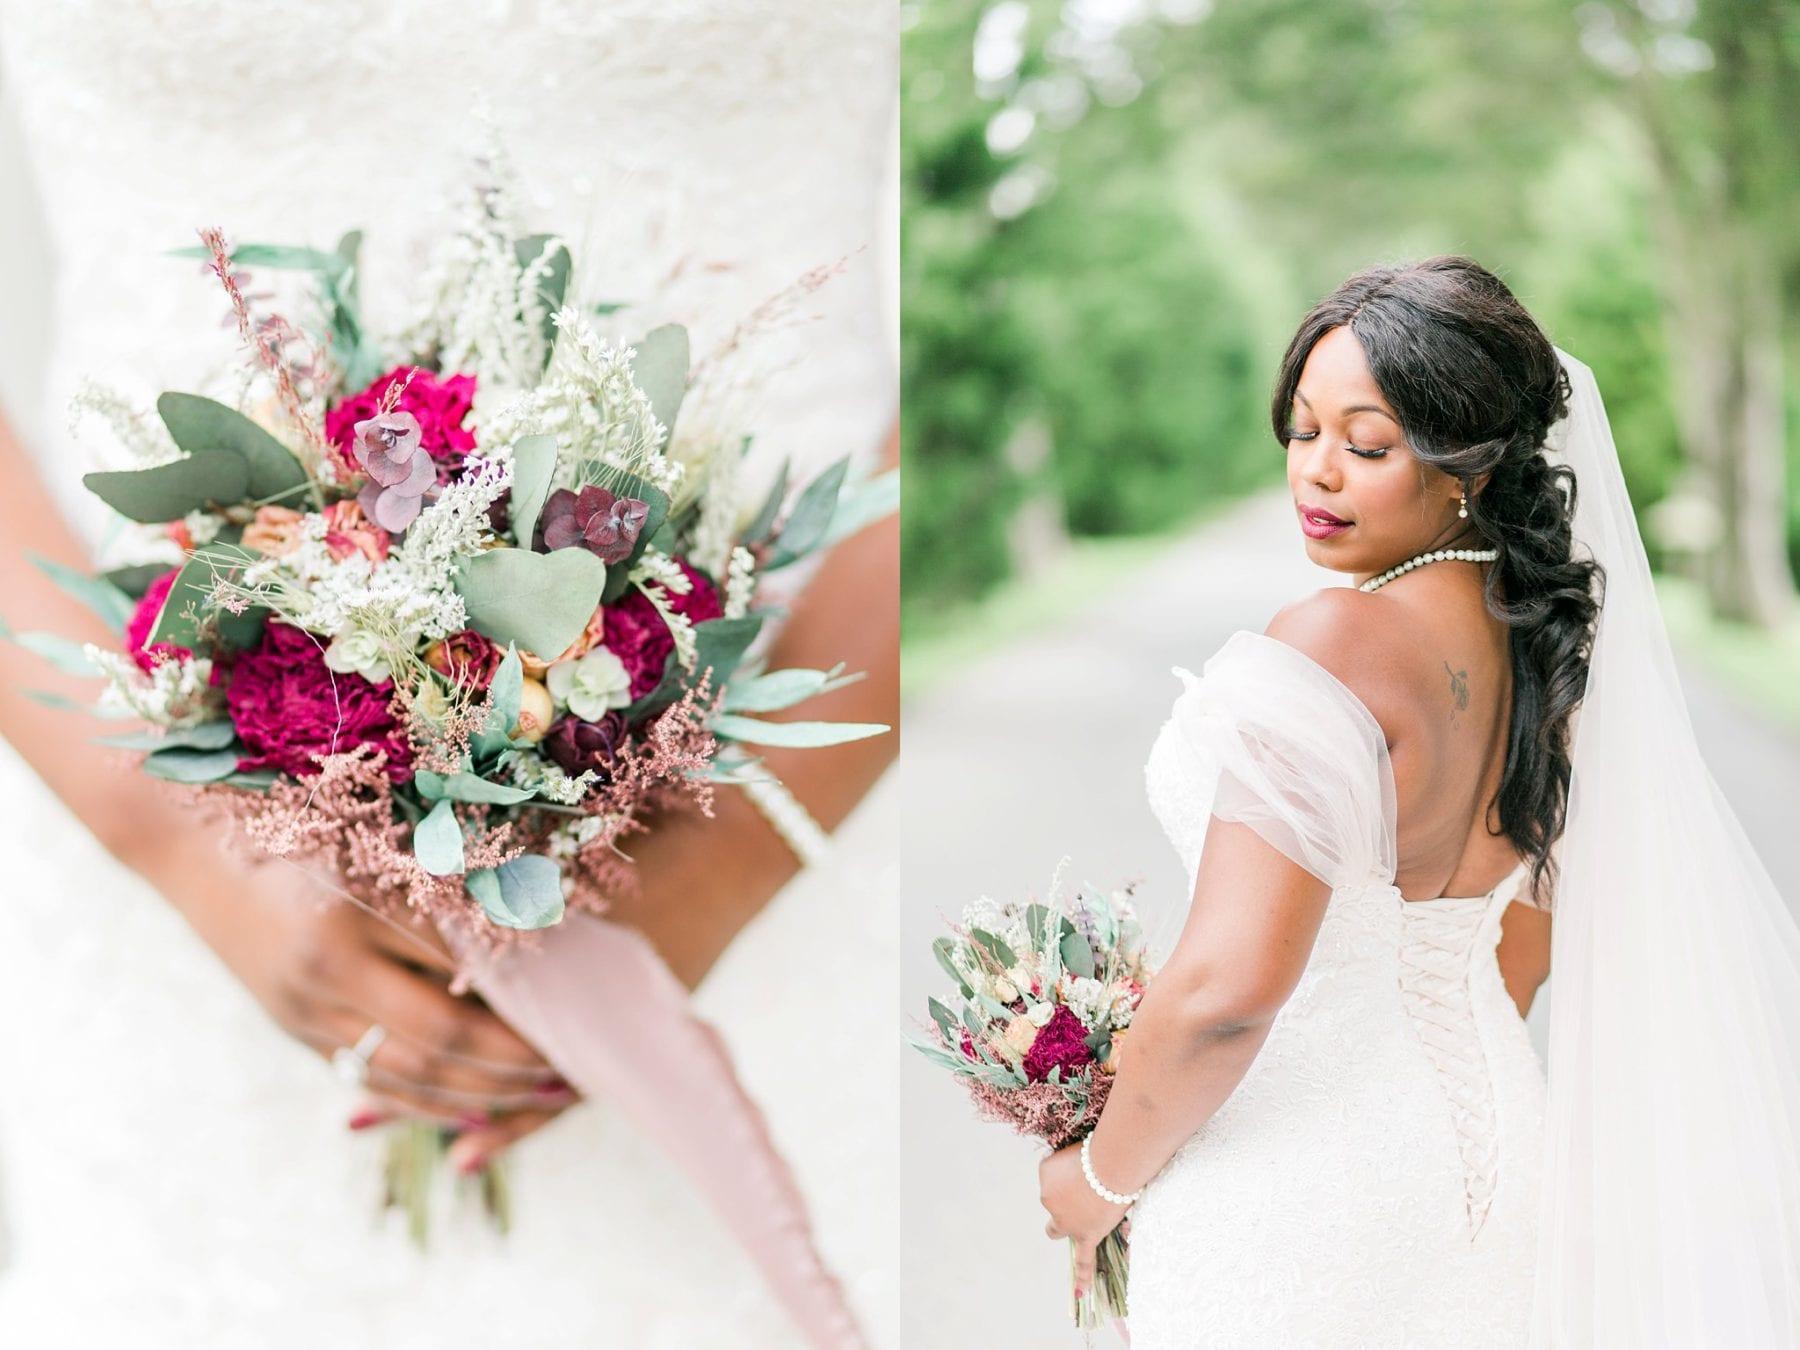 Jefferson Patterson Park Wedding Maryland Wedding Photographer Megan Kelsey Photography Jasmine & Seyi-69.jpg